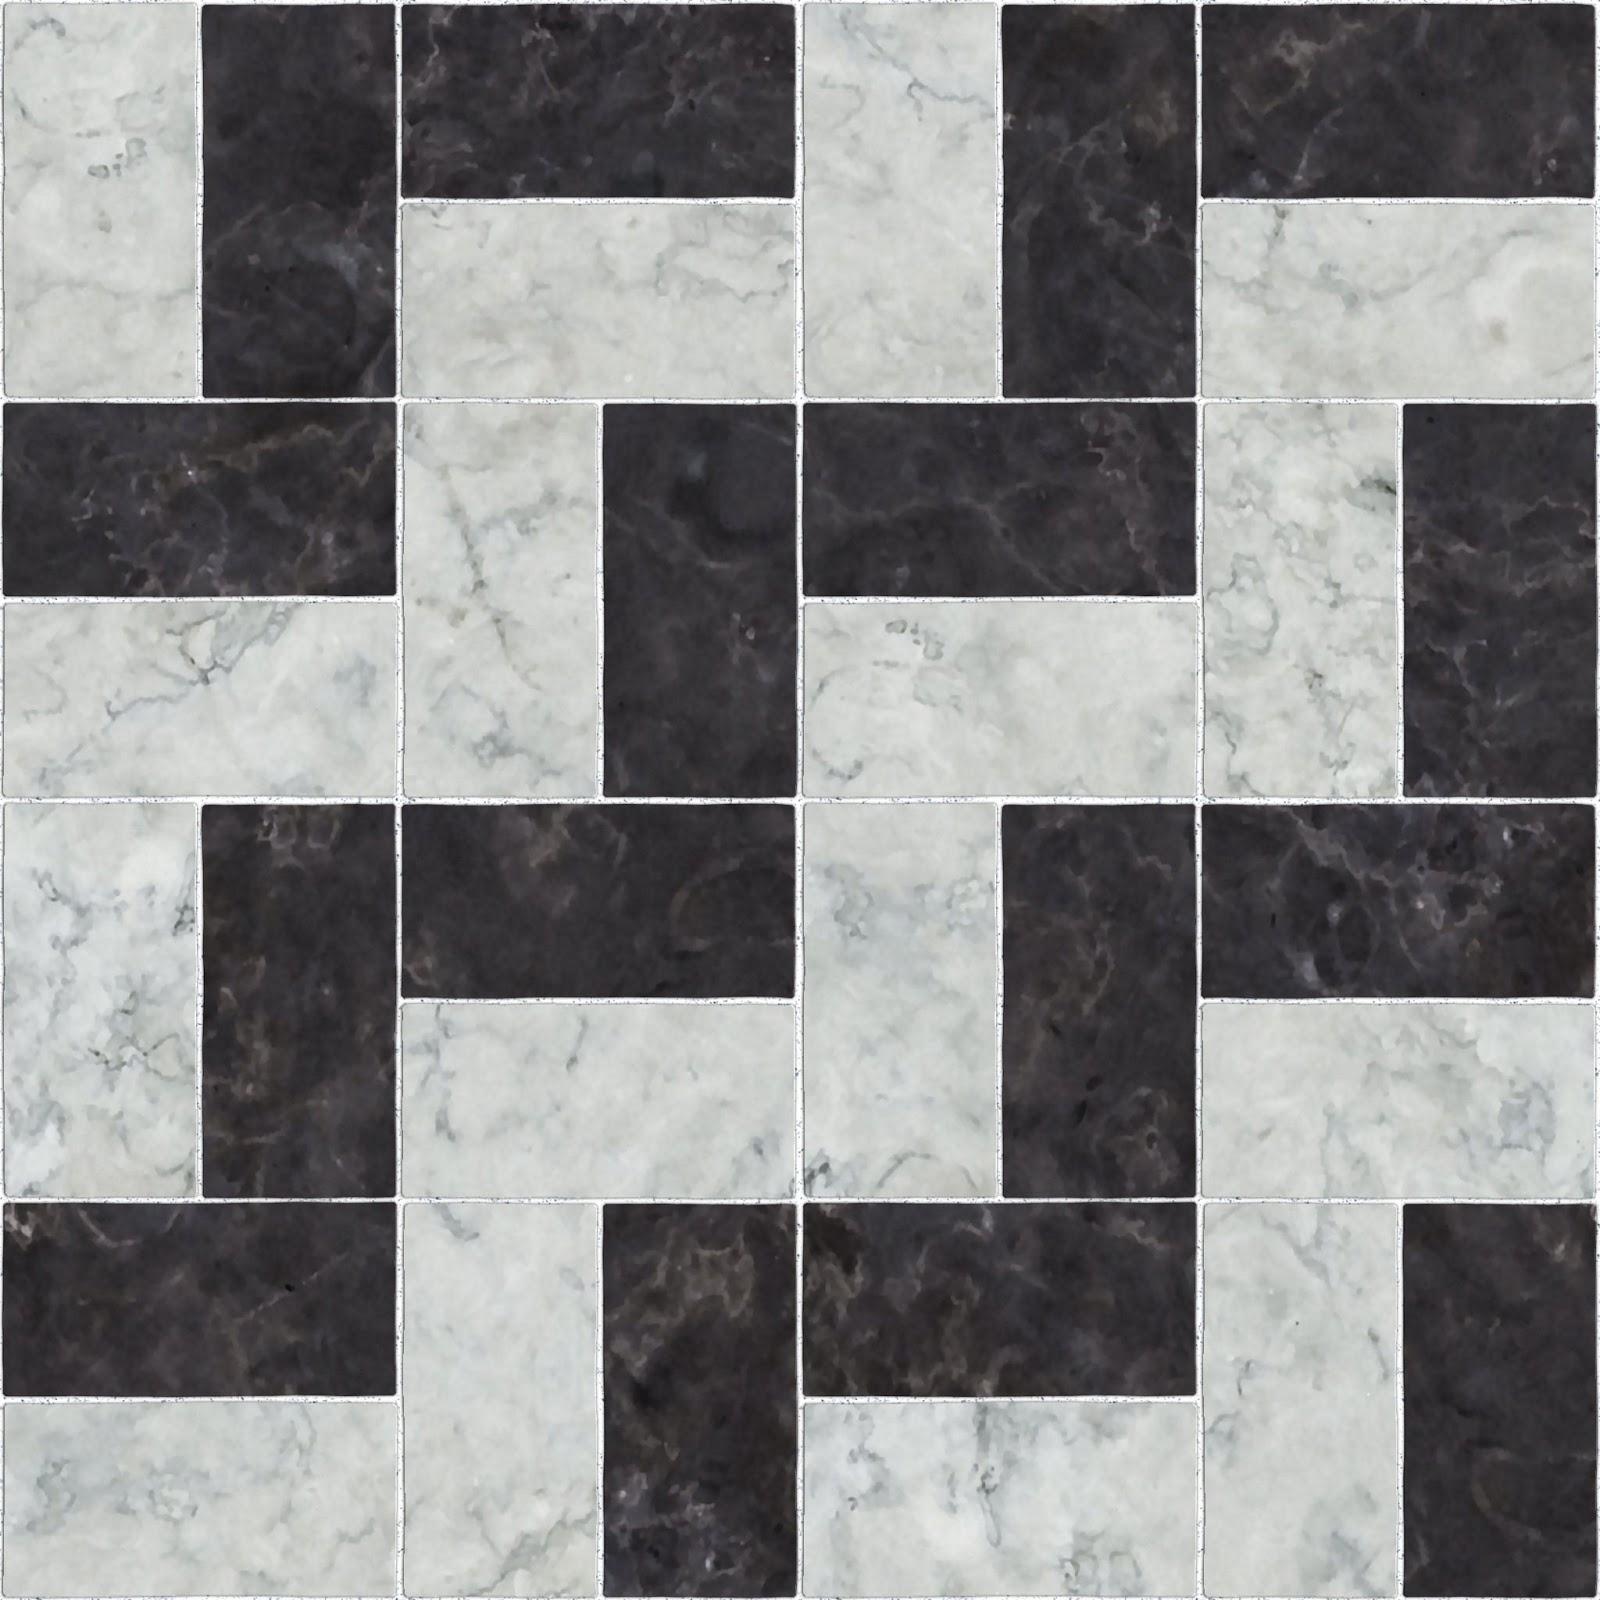 Bathroom Tiles Texture contemporary bathroom tile texture seamless white floor tiles on